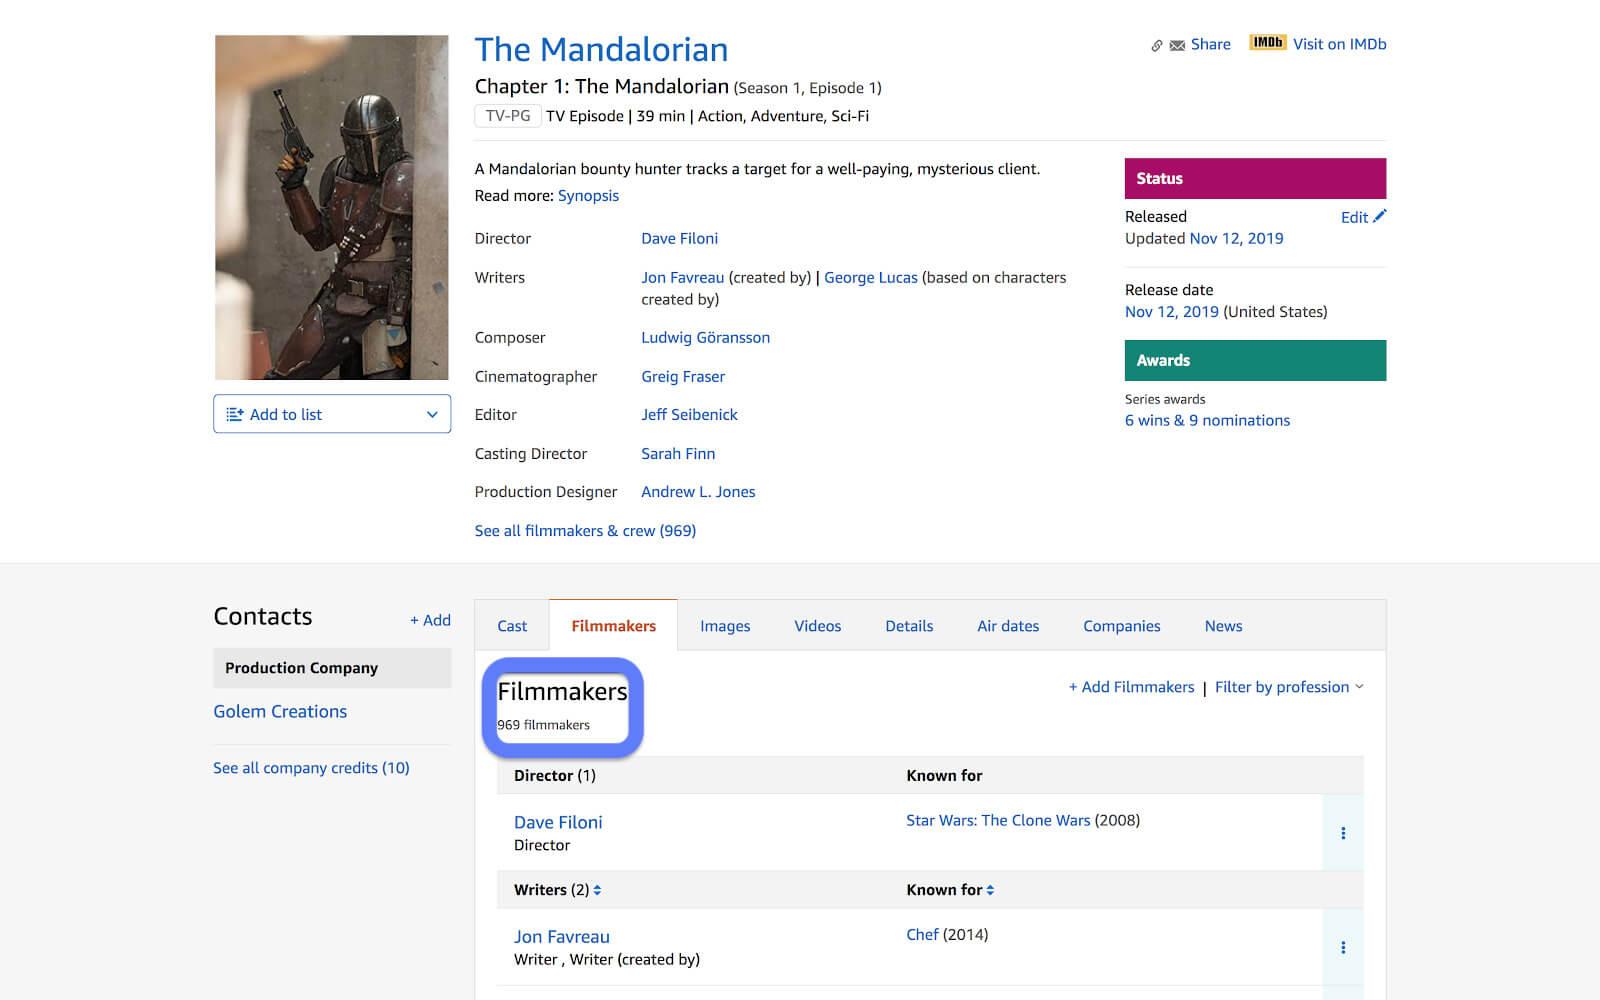 IMDb pro - The Mandalorian crew list